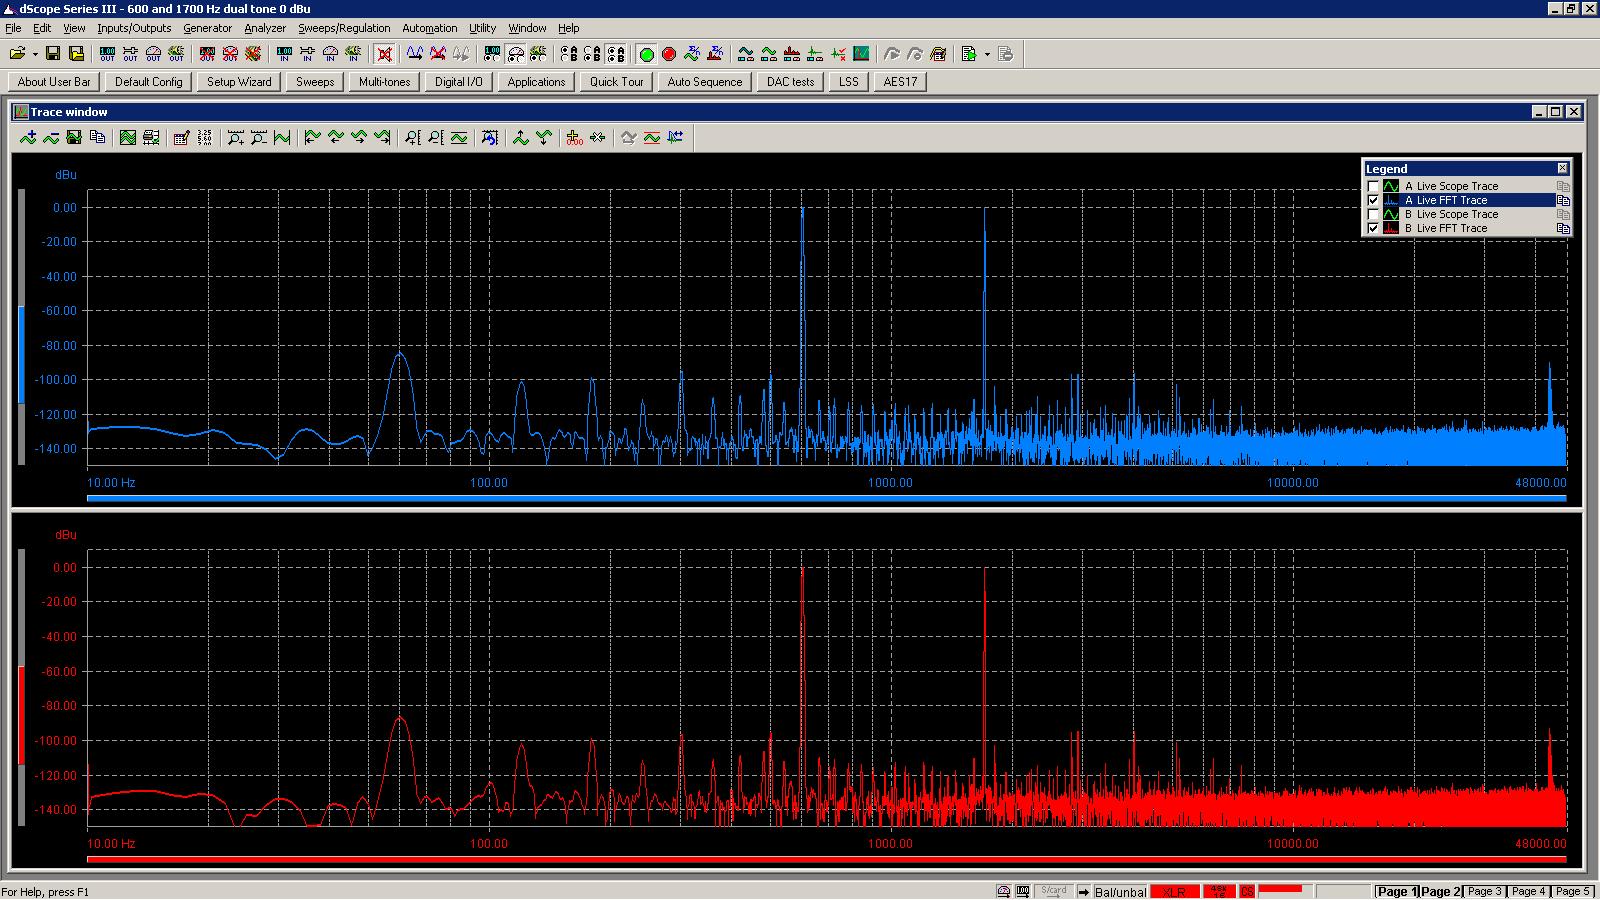 20160905 Jotunheim 600+1700Hz dual tone 0dBu 30R unBal.png